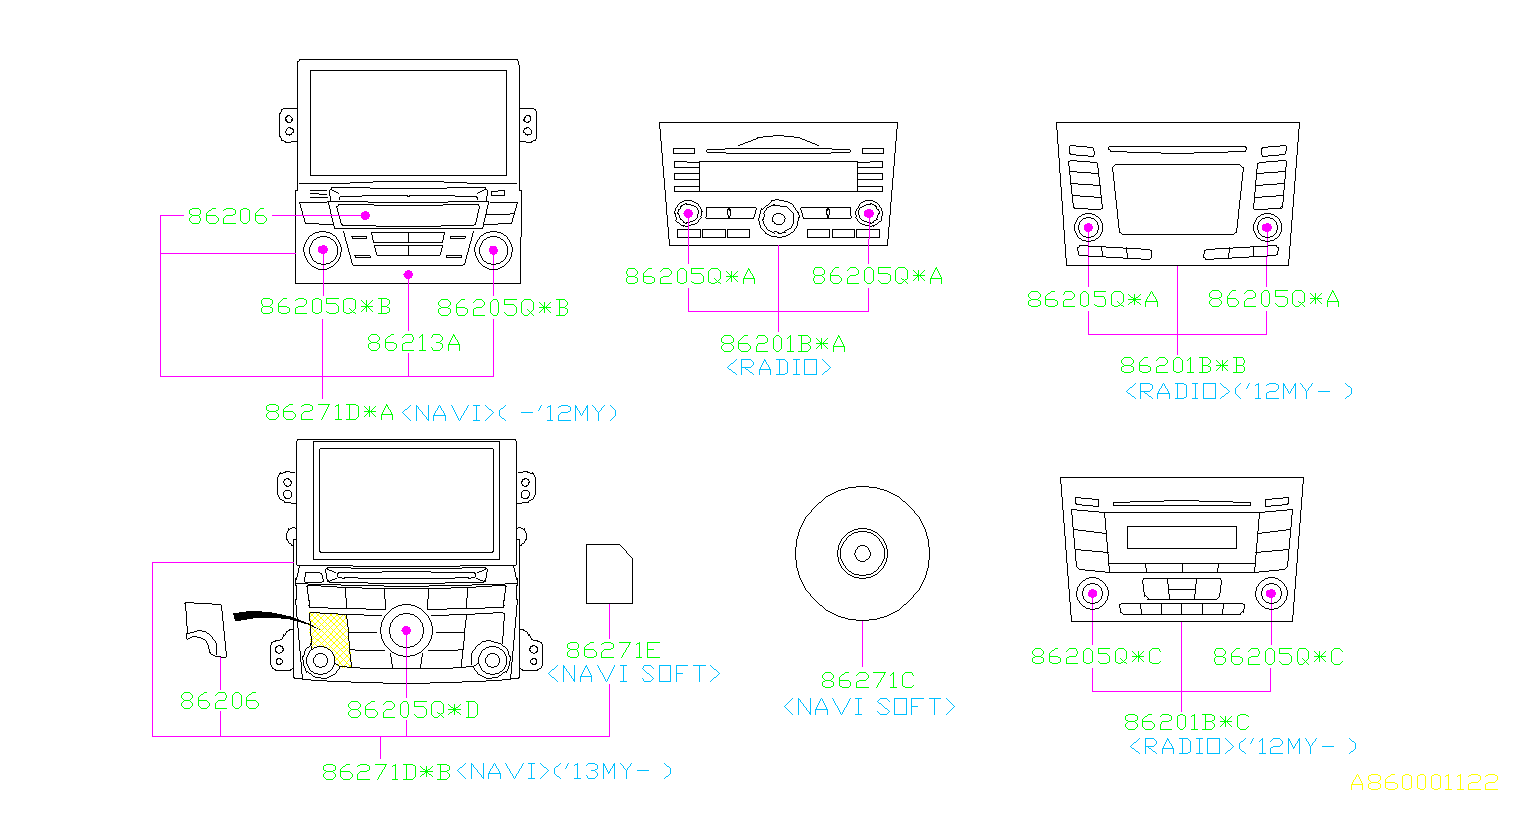 86201AJ61A     Stereo    deck Radio  electrical  clarion  body